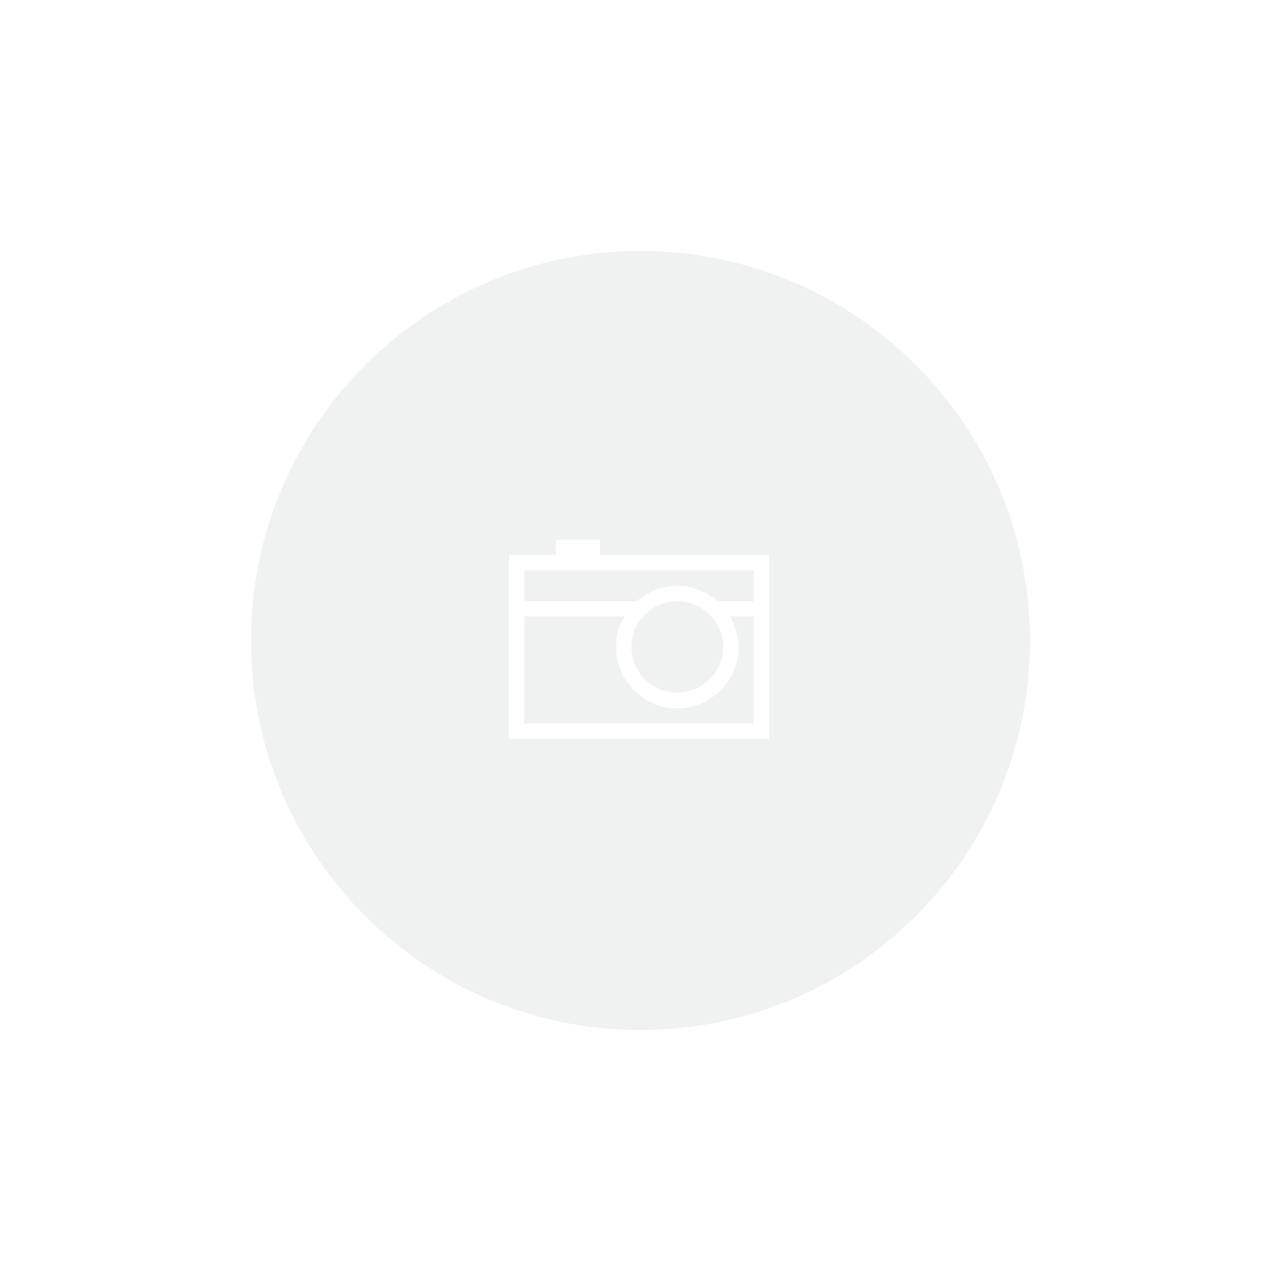 COROA 32D ICTUS NARROW WIDE BCD 104mm 4 FUROS (12V)